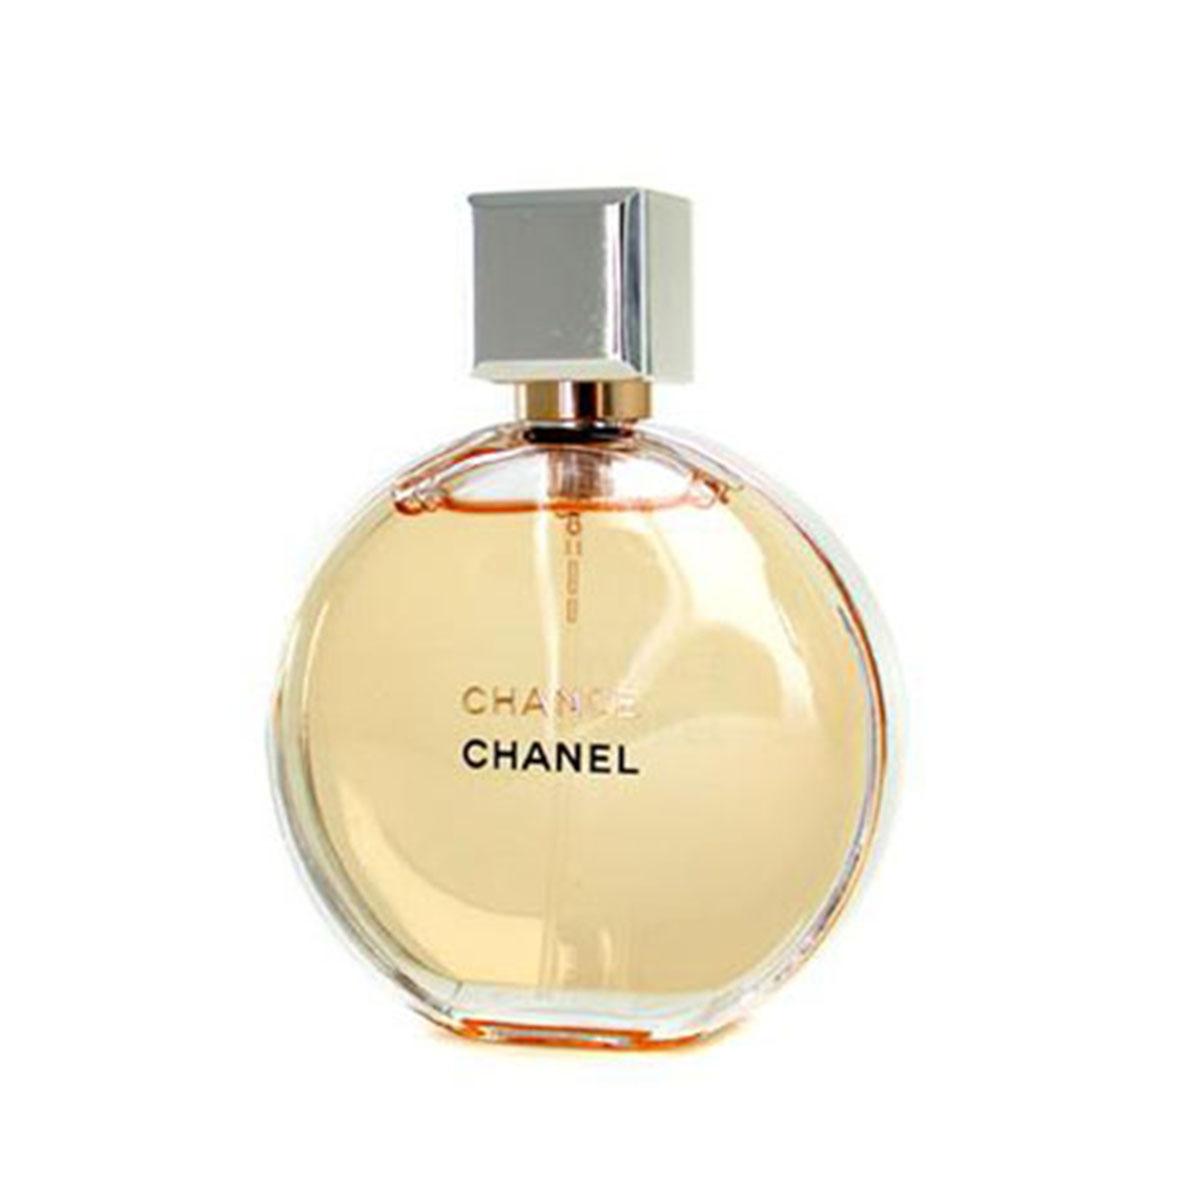 Chanel chance eau de parfum 50ml vaporizador